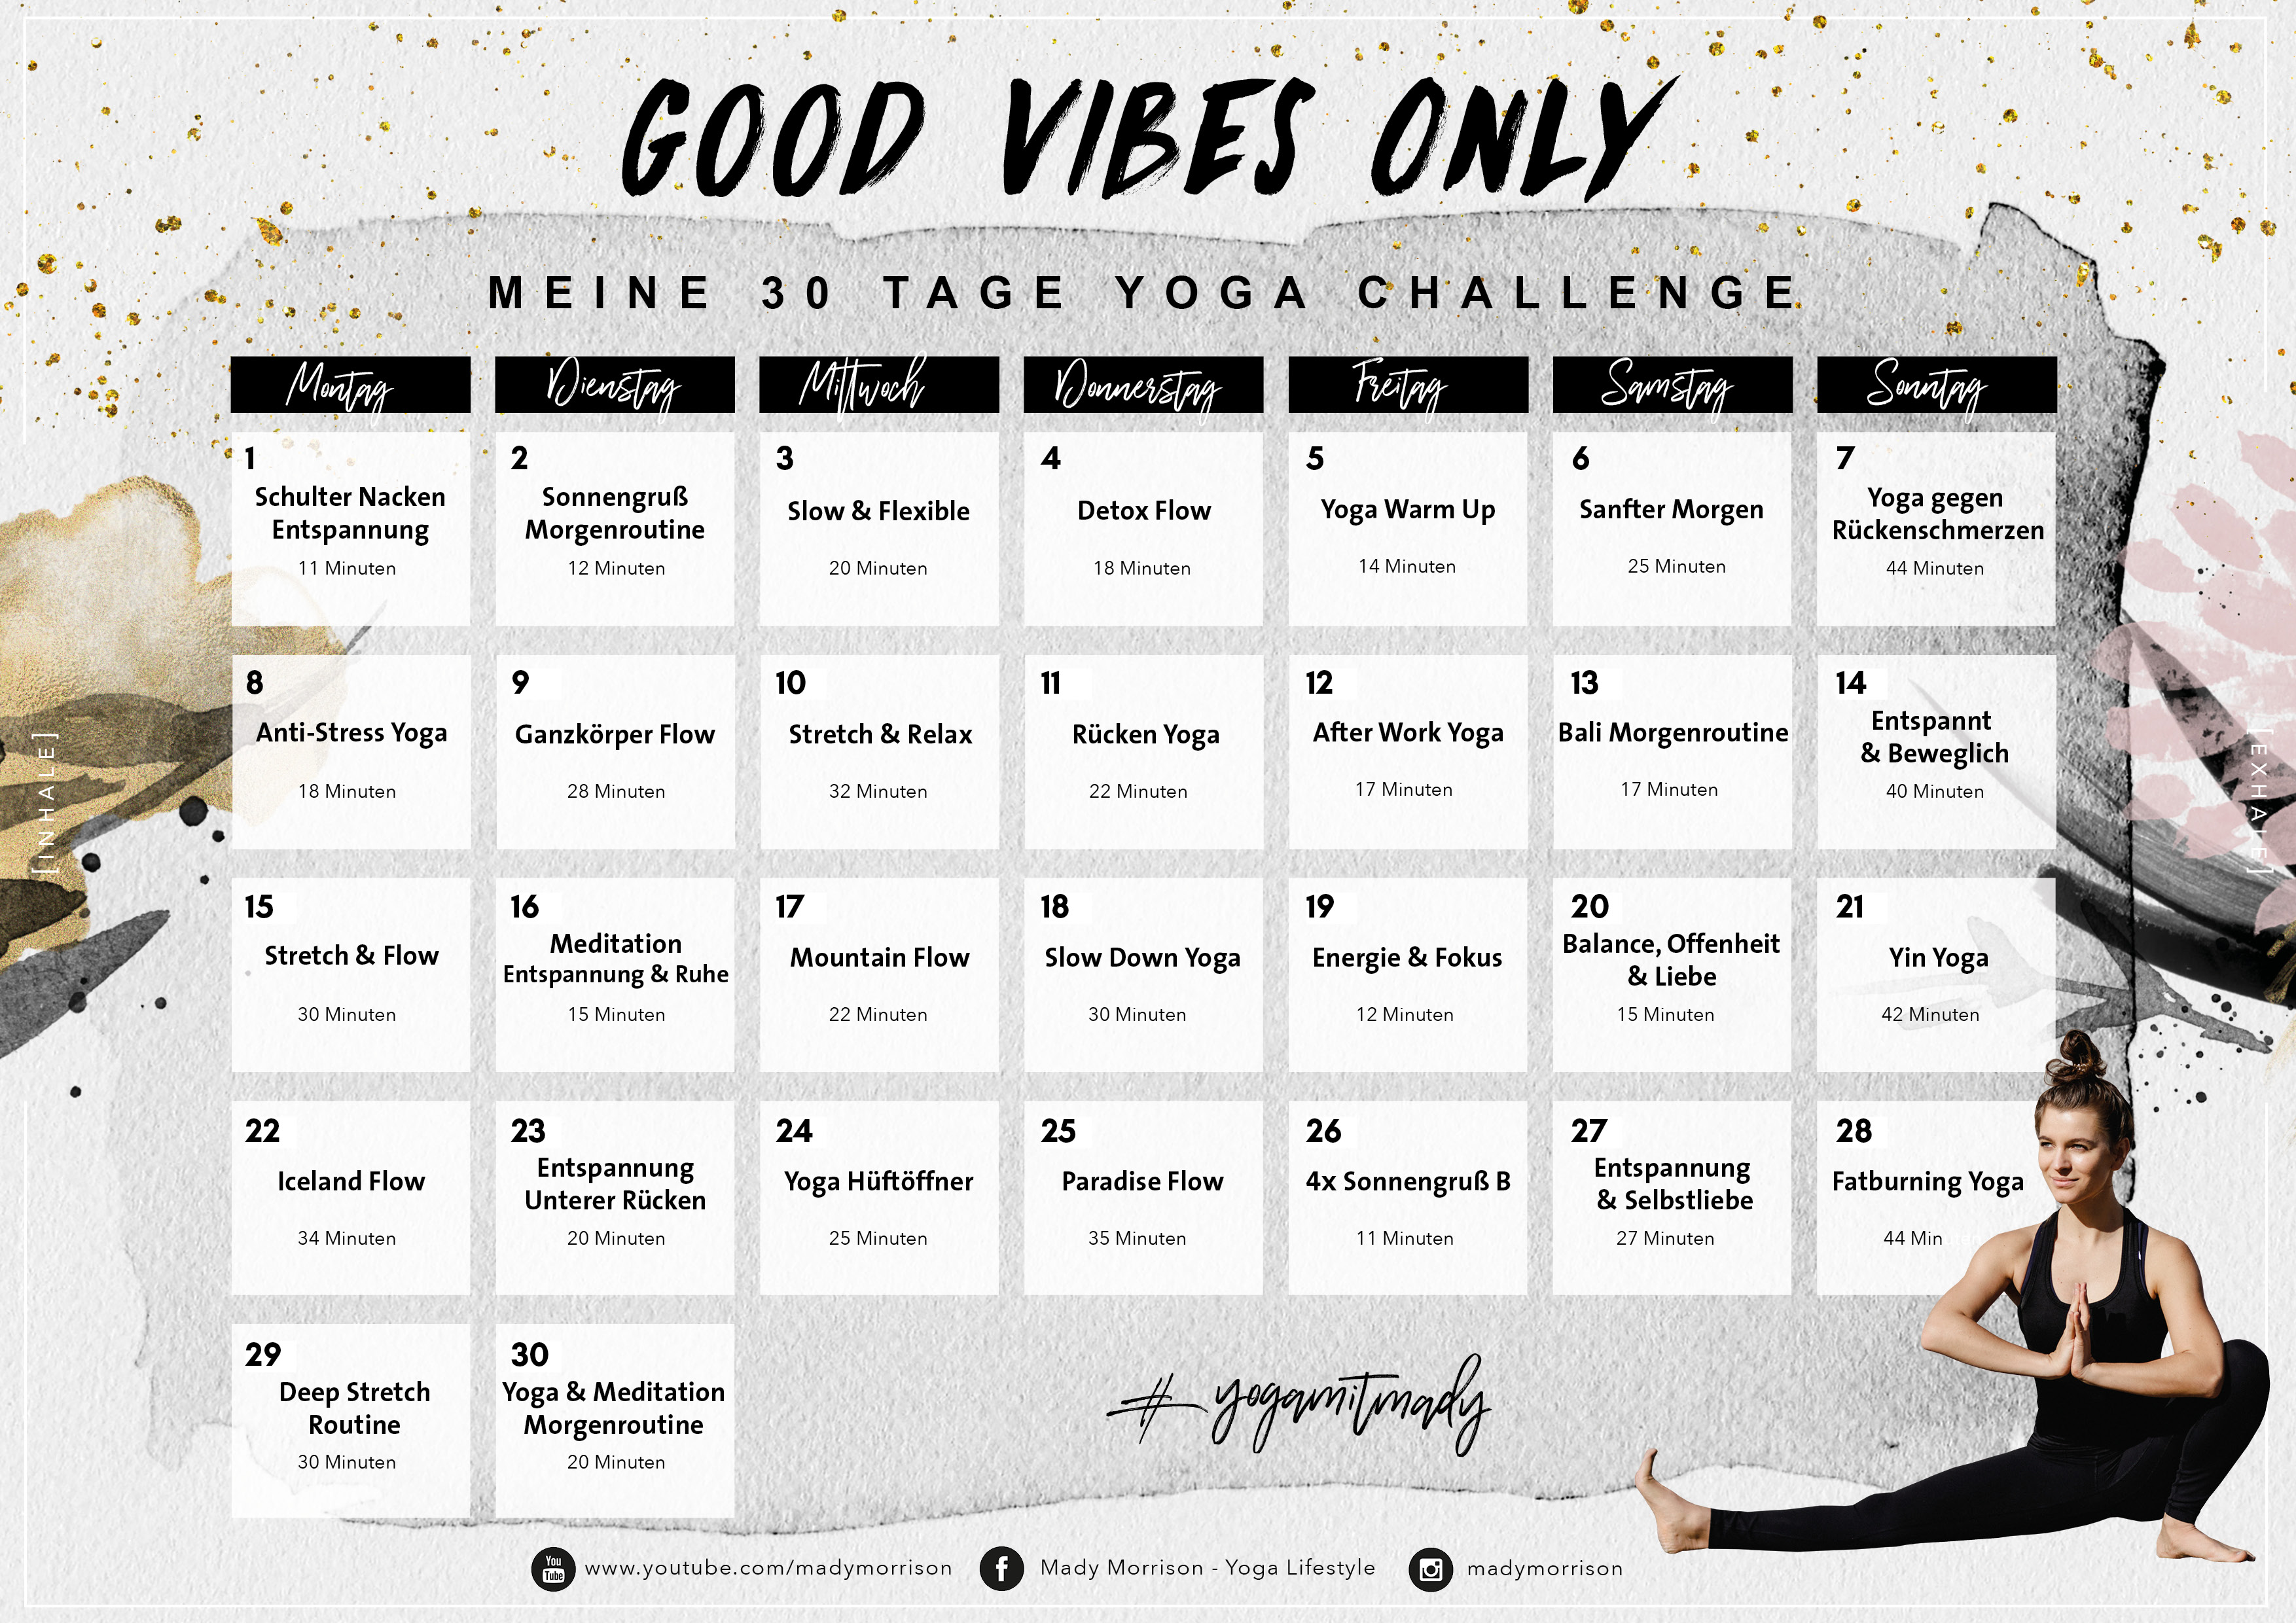 30-tage-yoga-challenge-2019-good-vibes-only-jpg